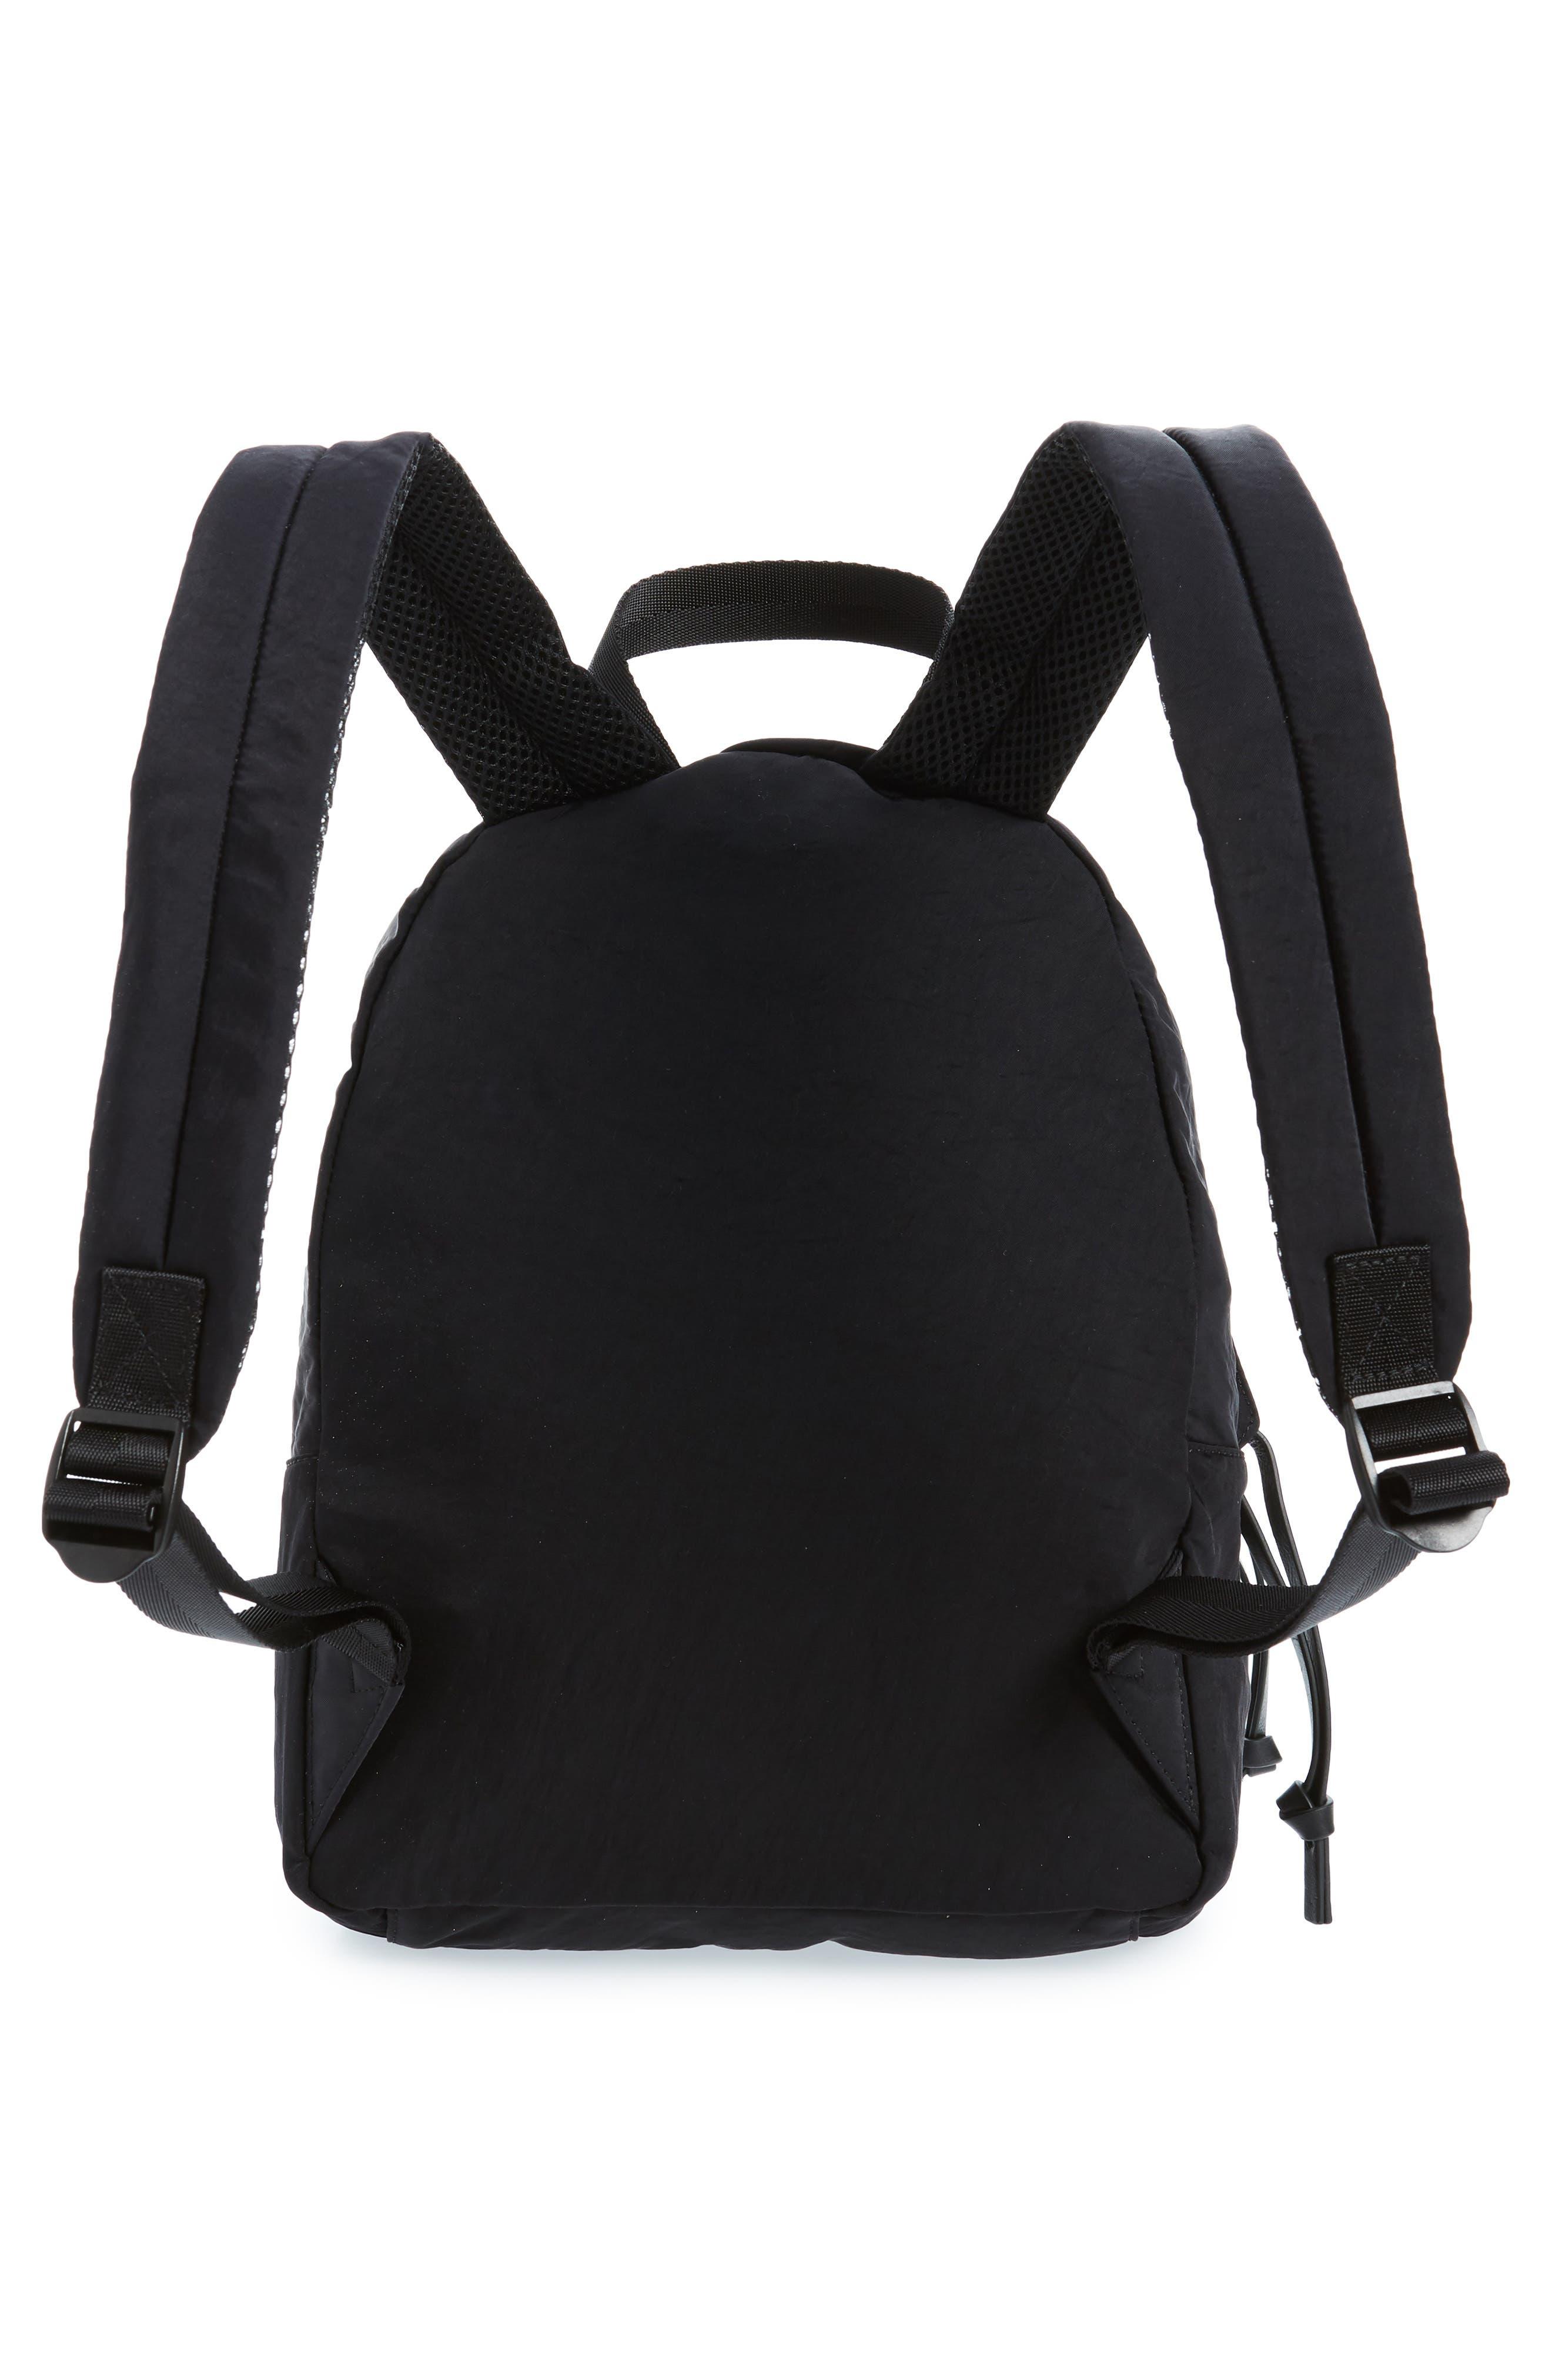 REBECCA MINKOFF, Nylon Backpack, Alternate thumbnail 4, color, BLACK